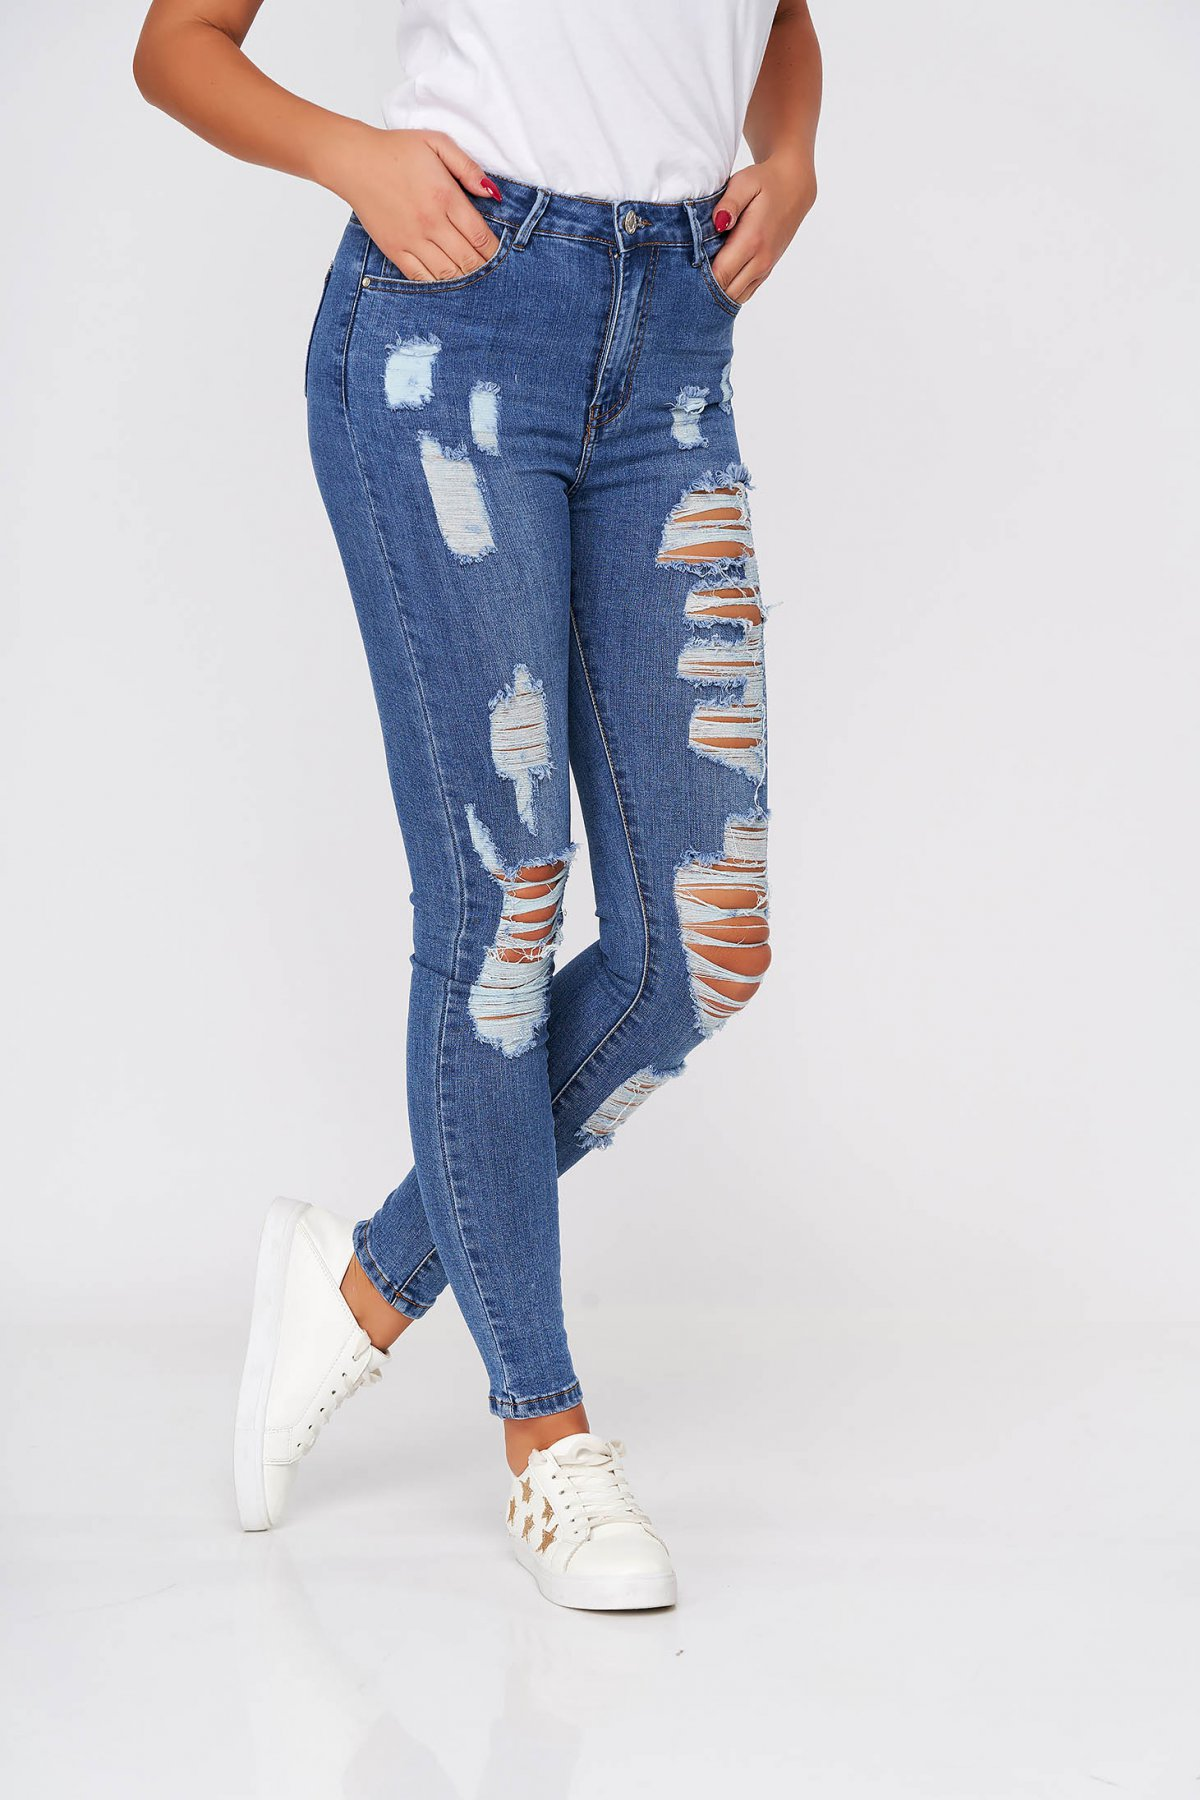 Poza Blugi SunShine albastri casual skinny cu talie inalta din bumbac elastic